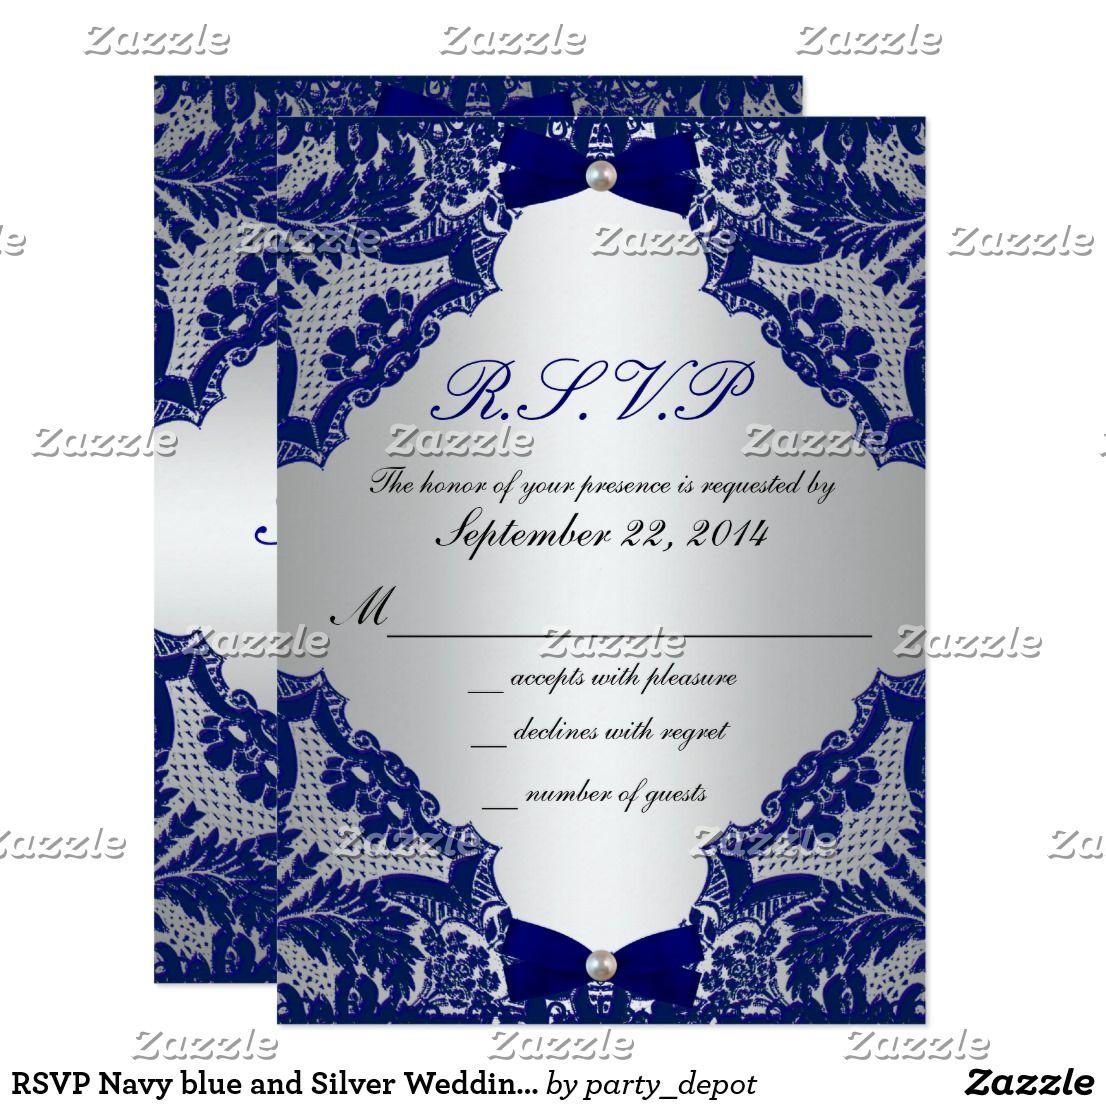 RSVP Navy blue and Silver Wedding Invitation